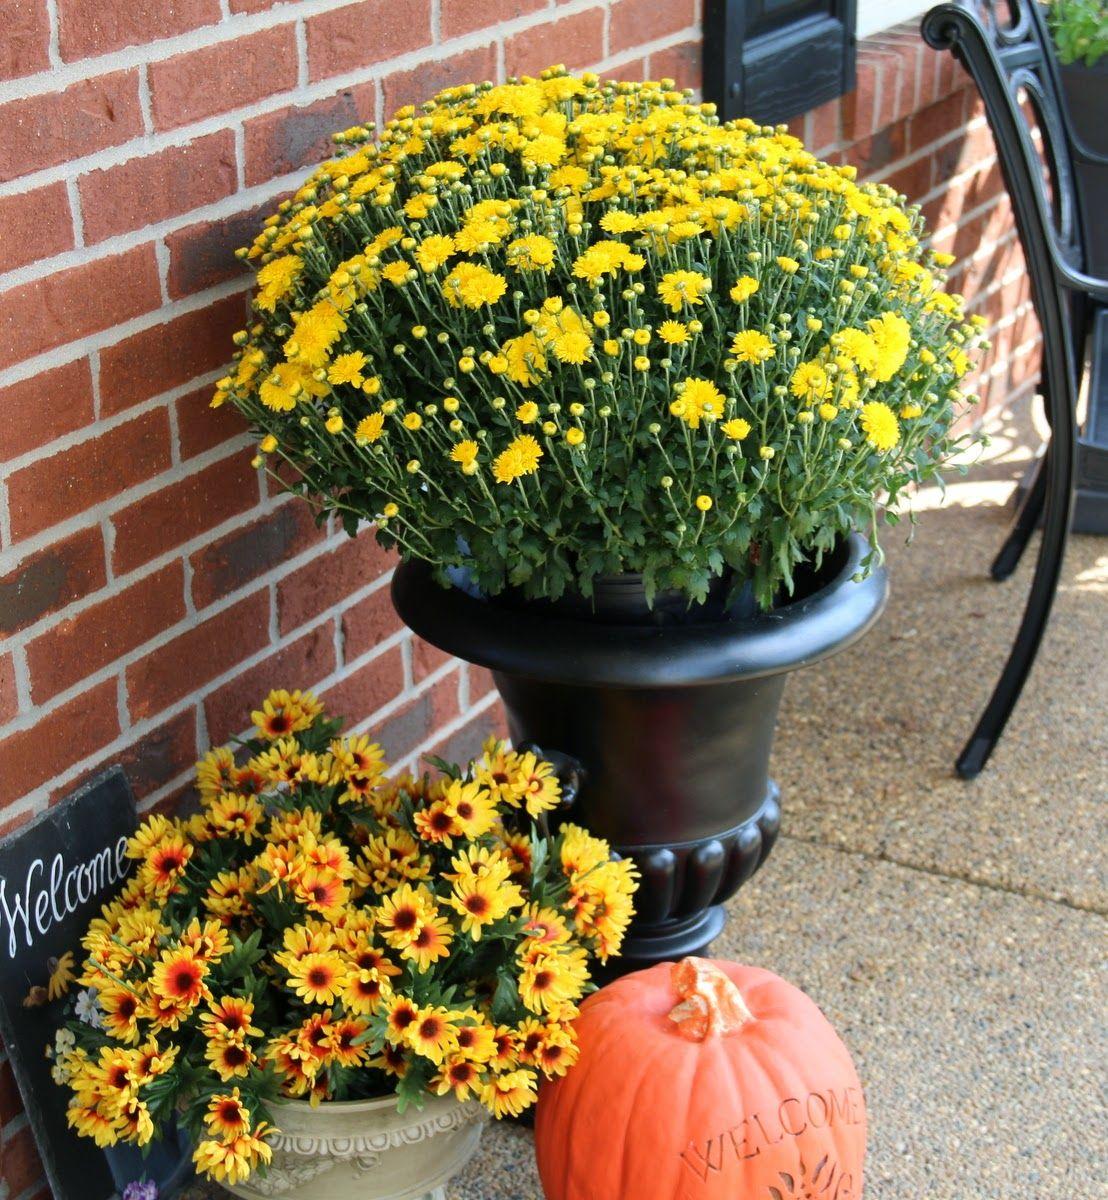 My Kentucky Living My Kentucky Life: Fall...It Finally Came.